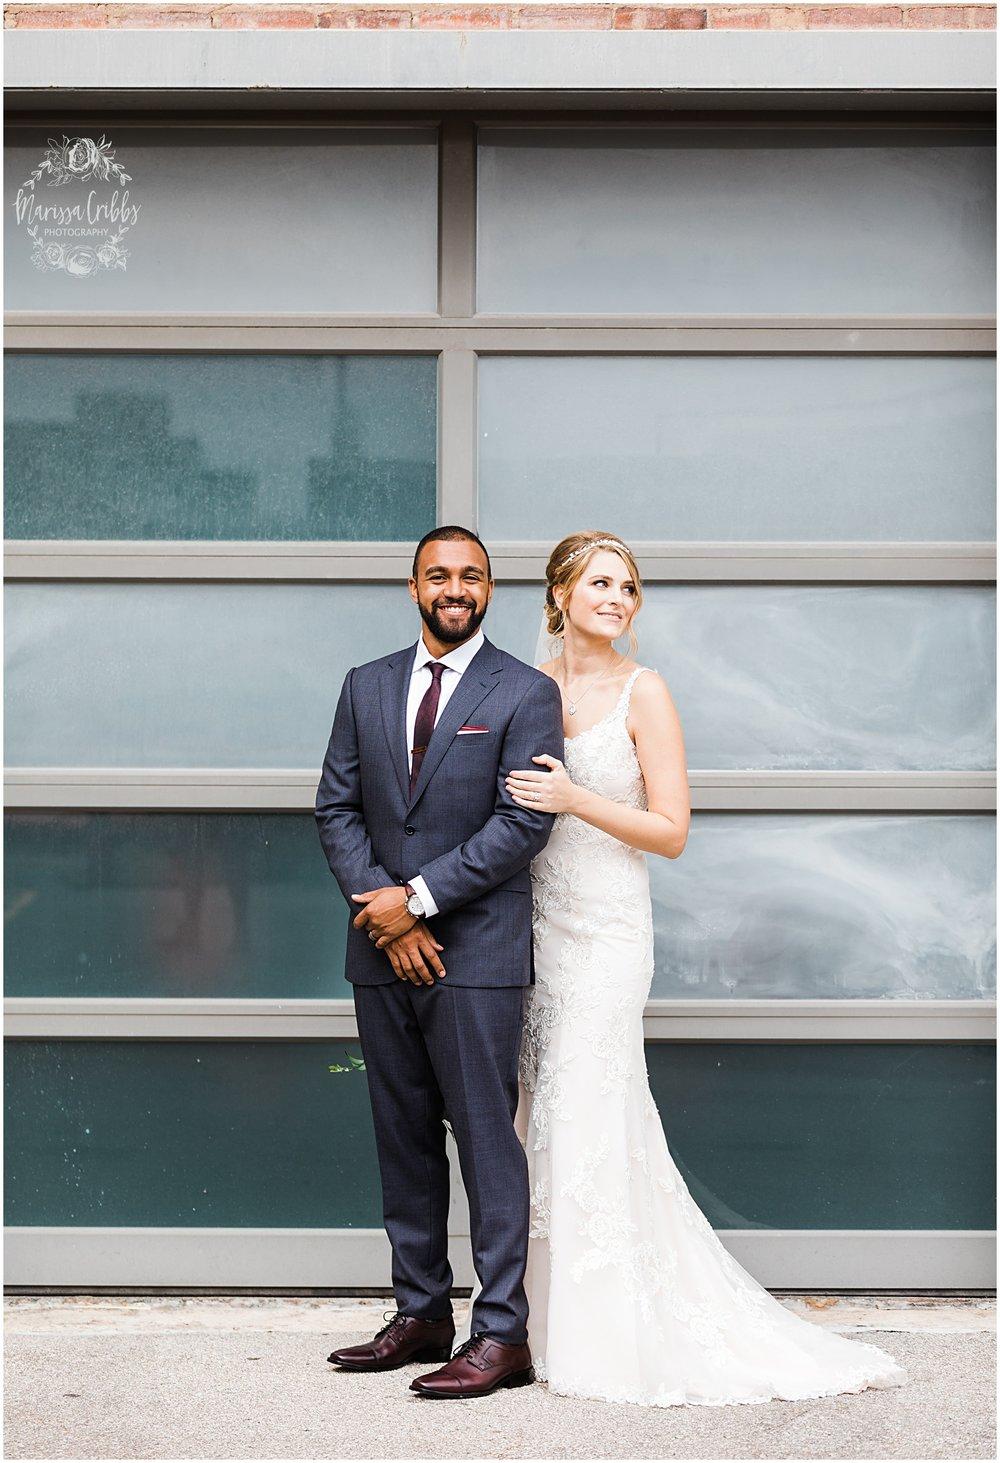 BAUER WEDDING | KELSEA & JUSTIN | MARISSA CRIBBS PHOTOGRAPHY_6533.jpg